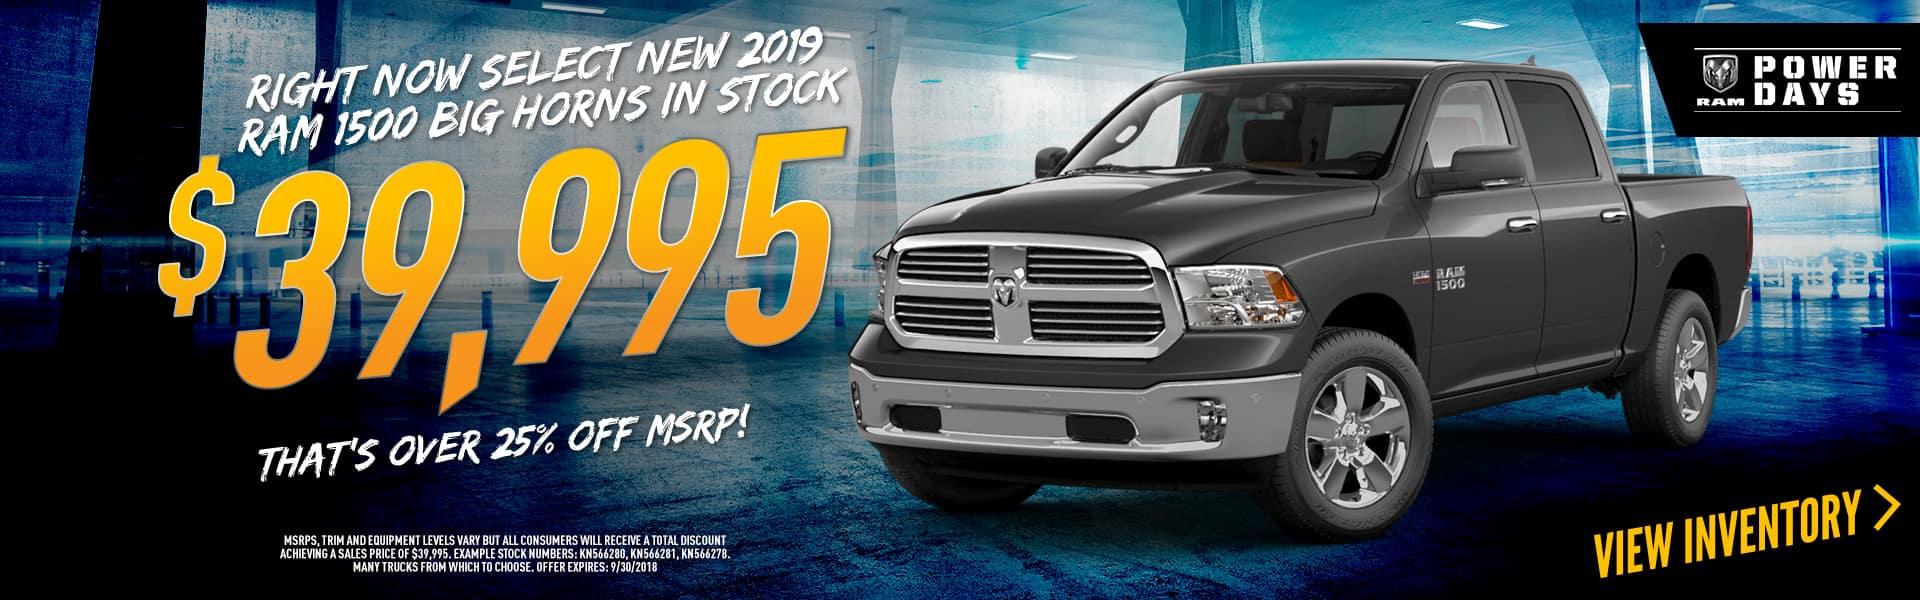 2019-ram-1500-big-horns-in-stock-oklahoma-city